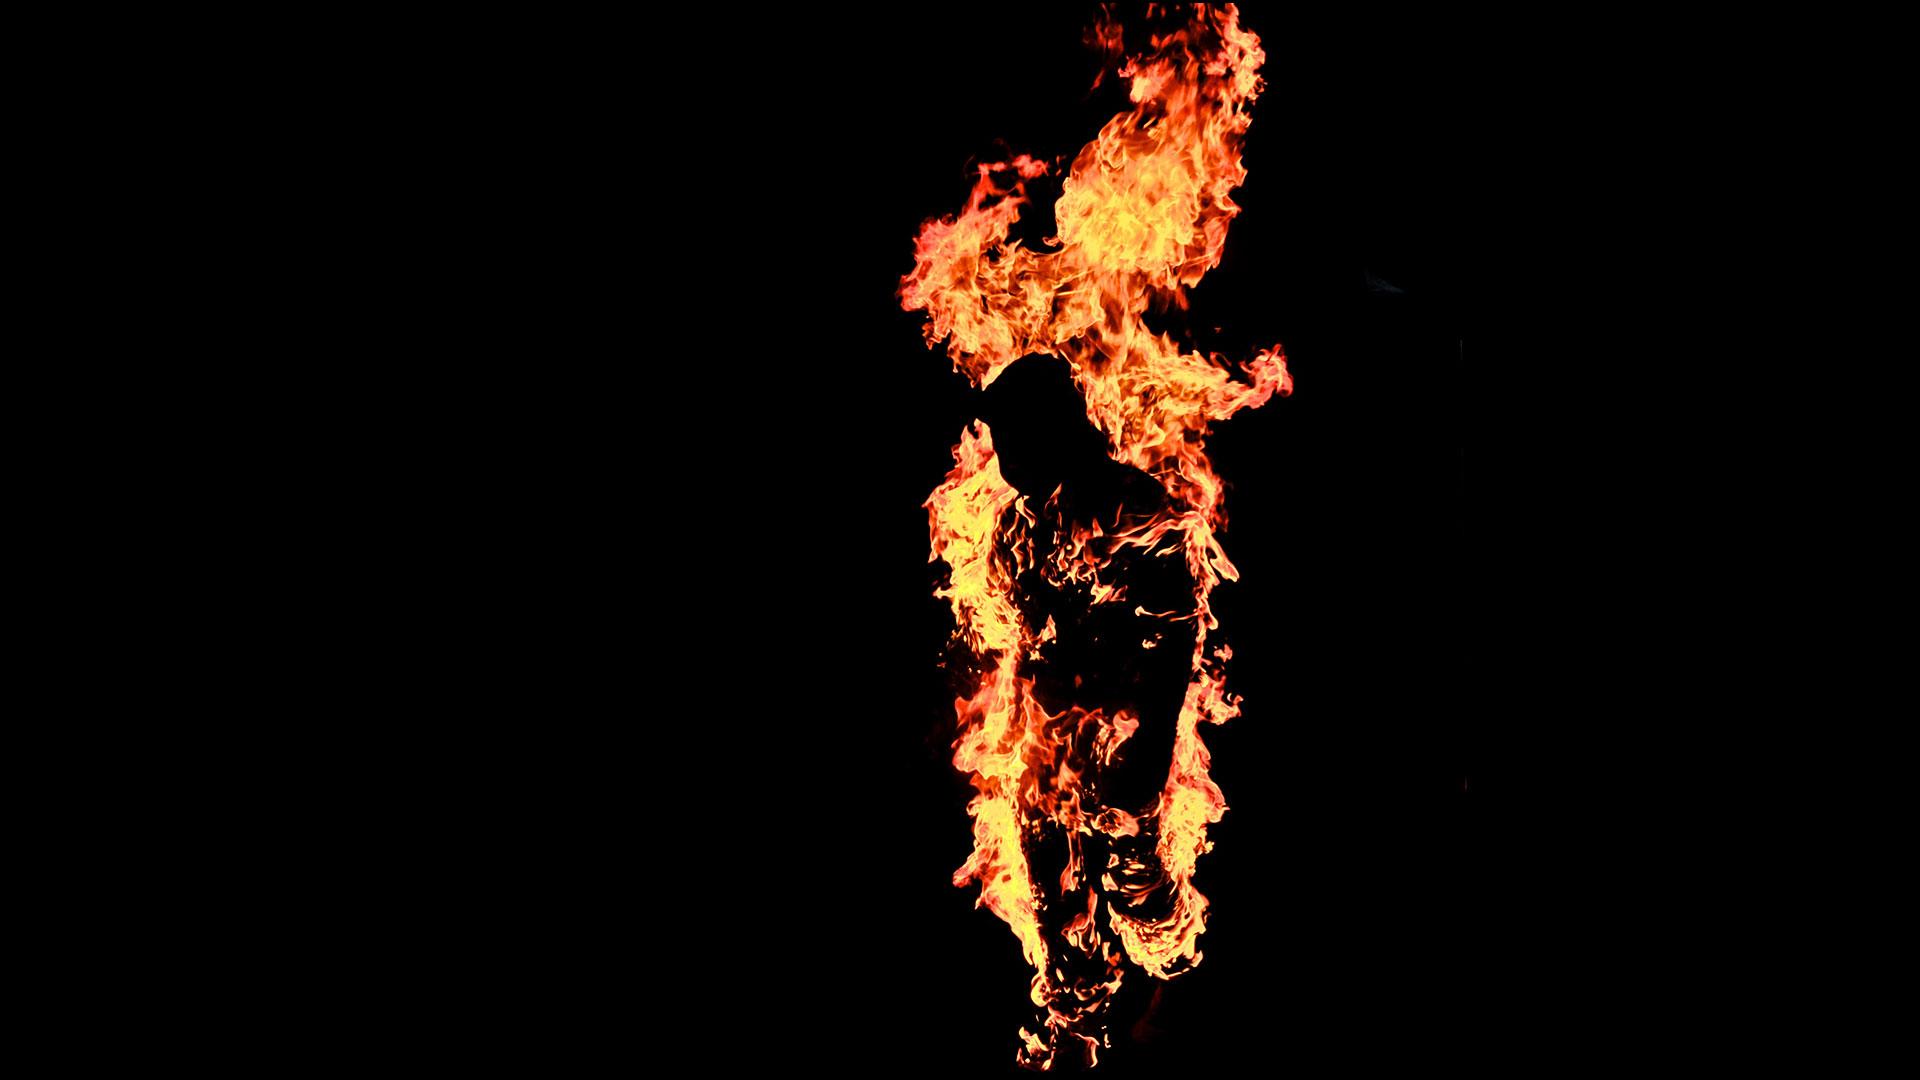 LB_fireburn_art